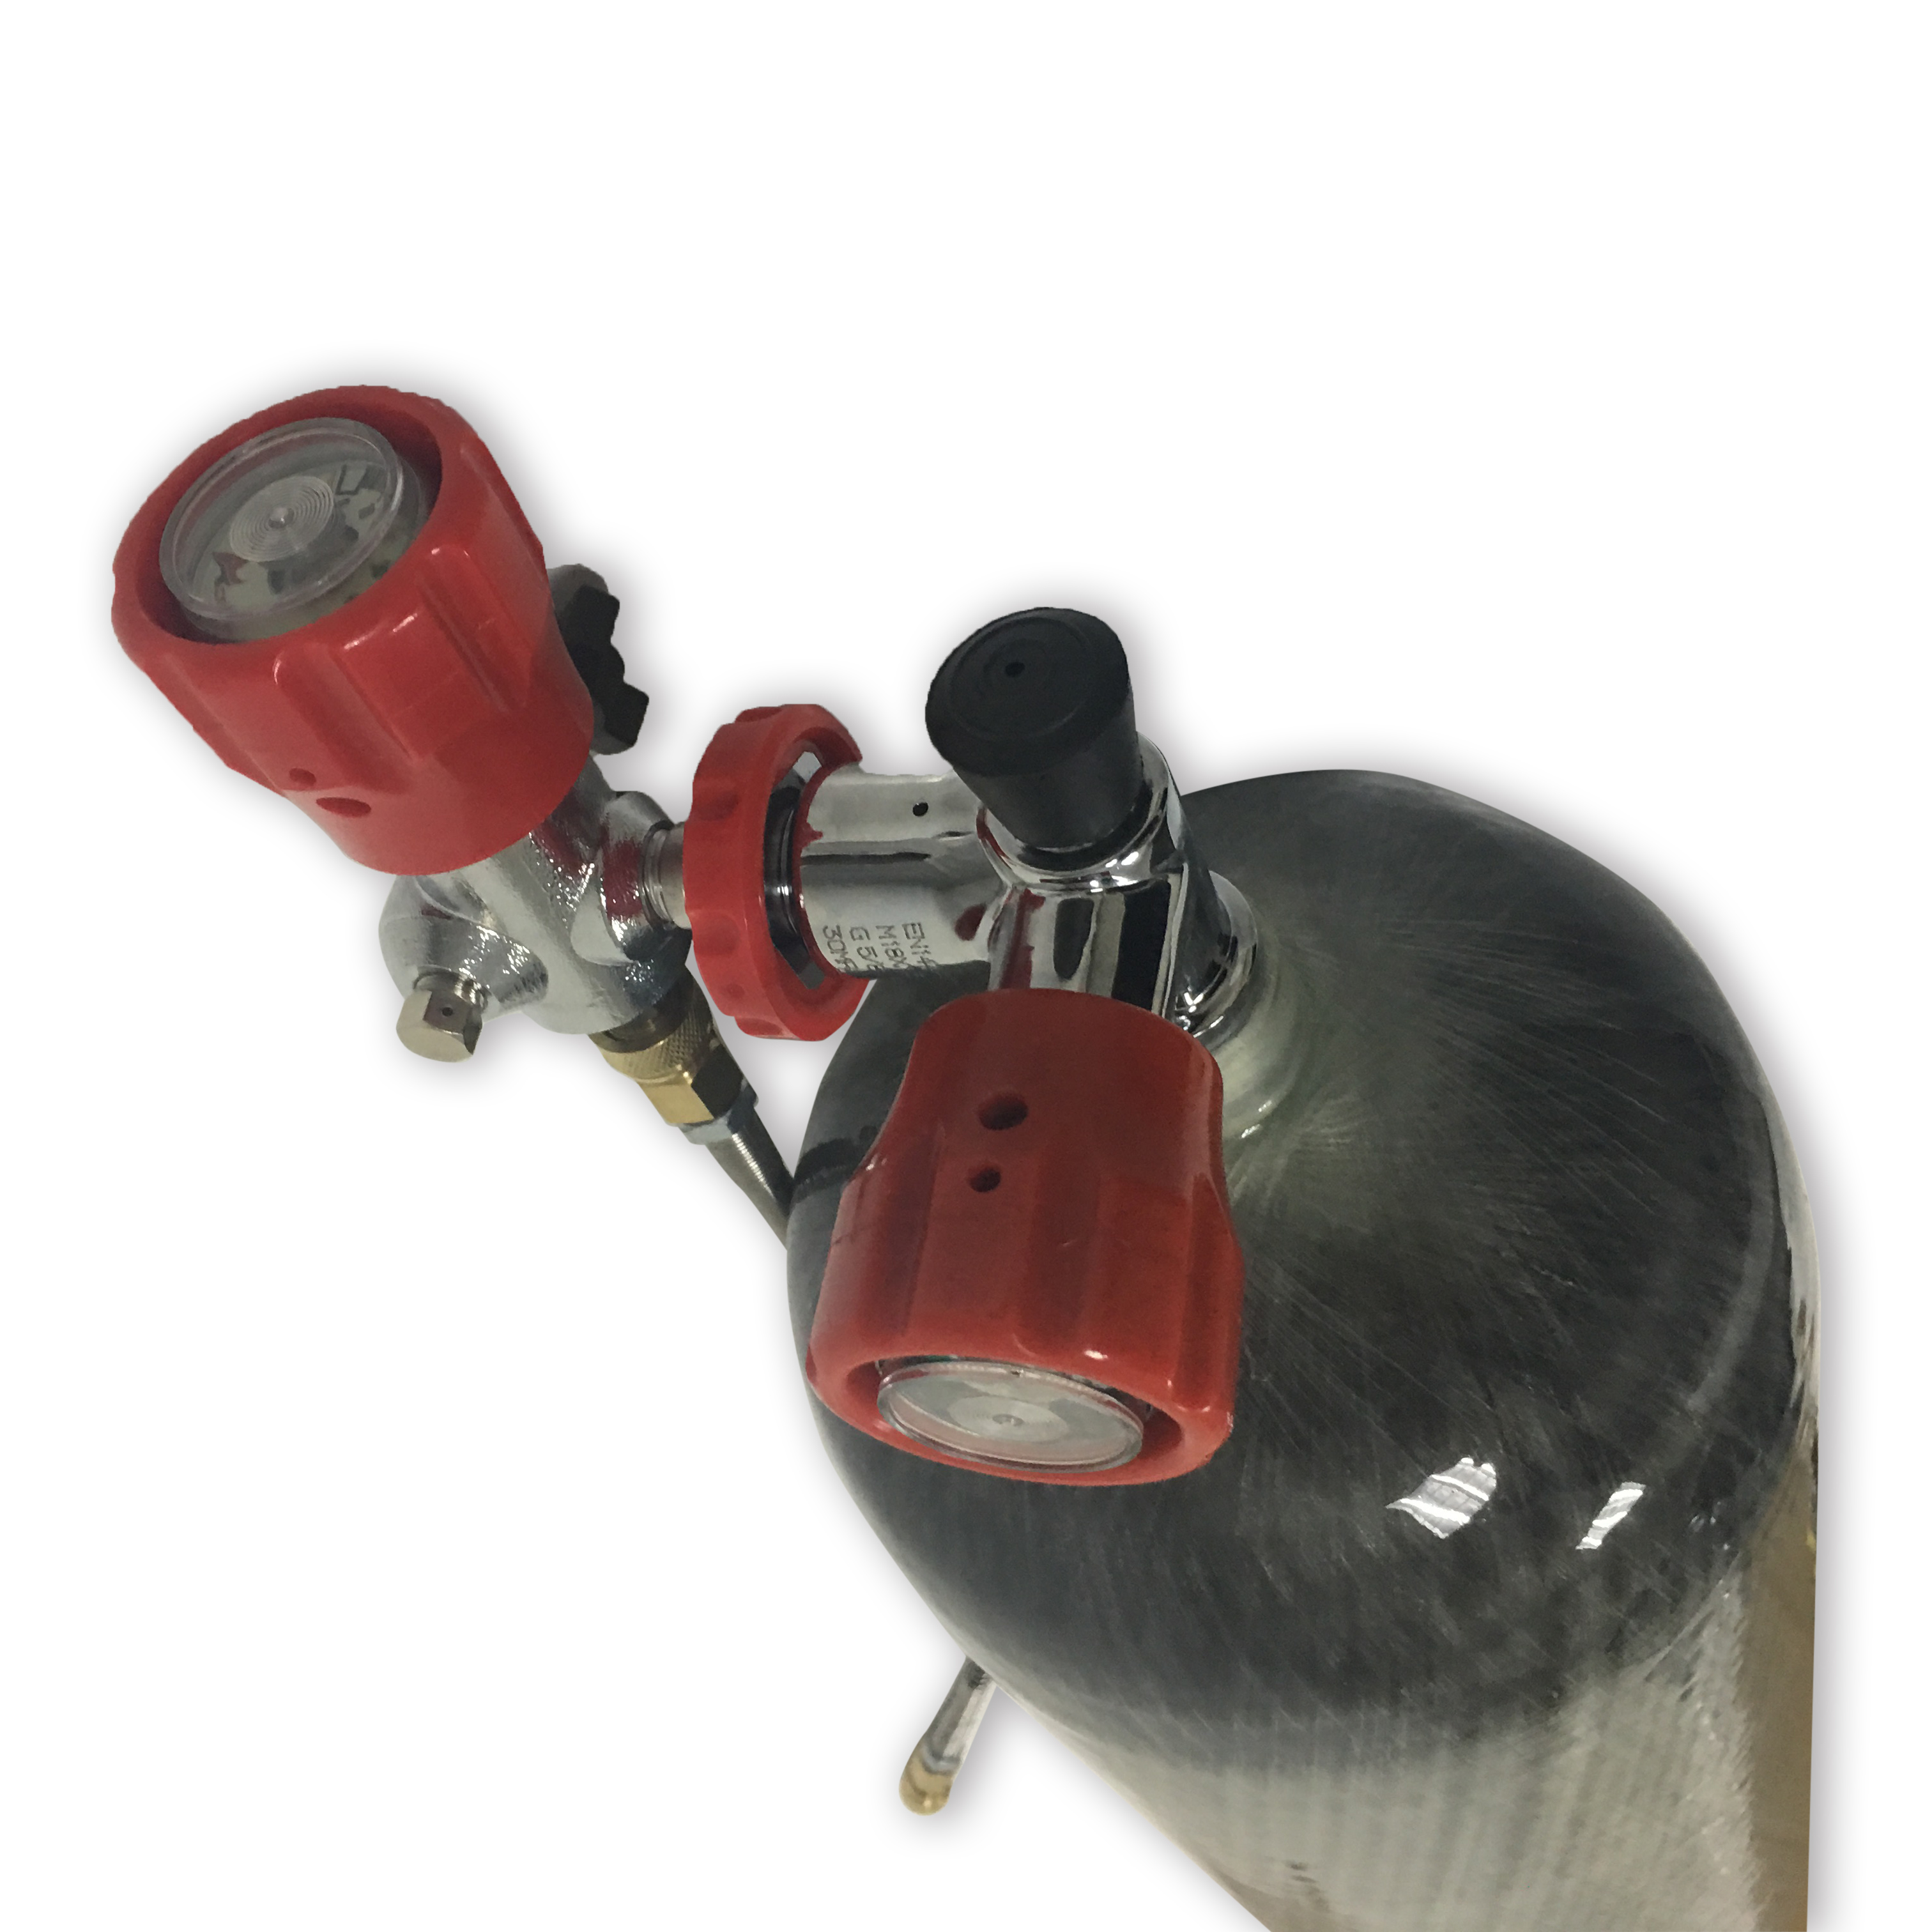 AC109101 Hpa Tank 4500psi Scuba Pcp Rifle Air Carbon Tank Airforce Condor Valve Diving Cylinder Mini Scuba Diving ACECARE Hot